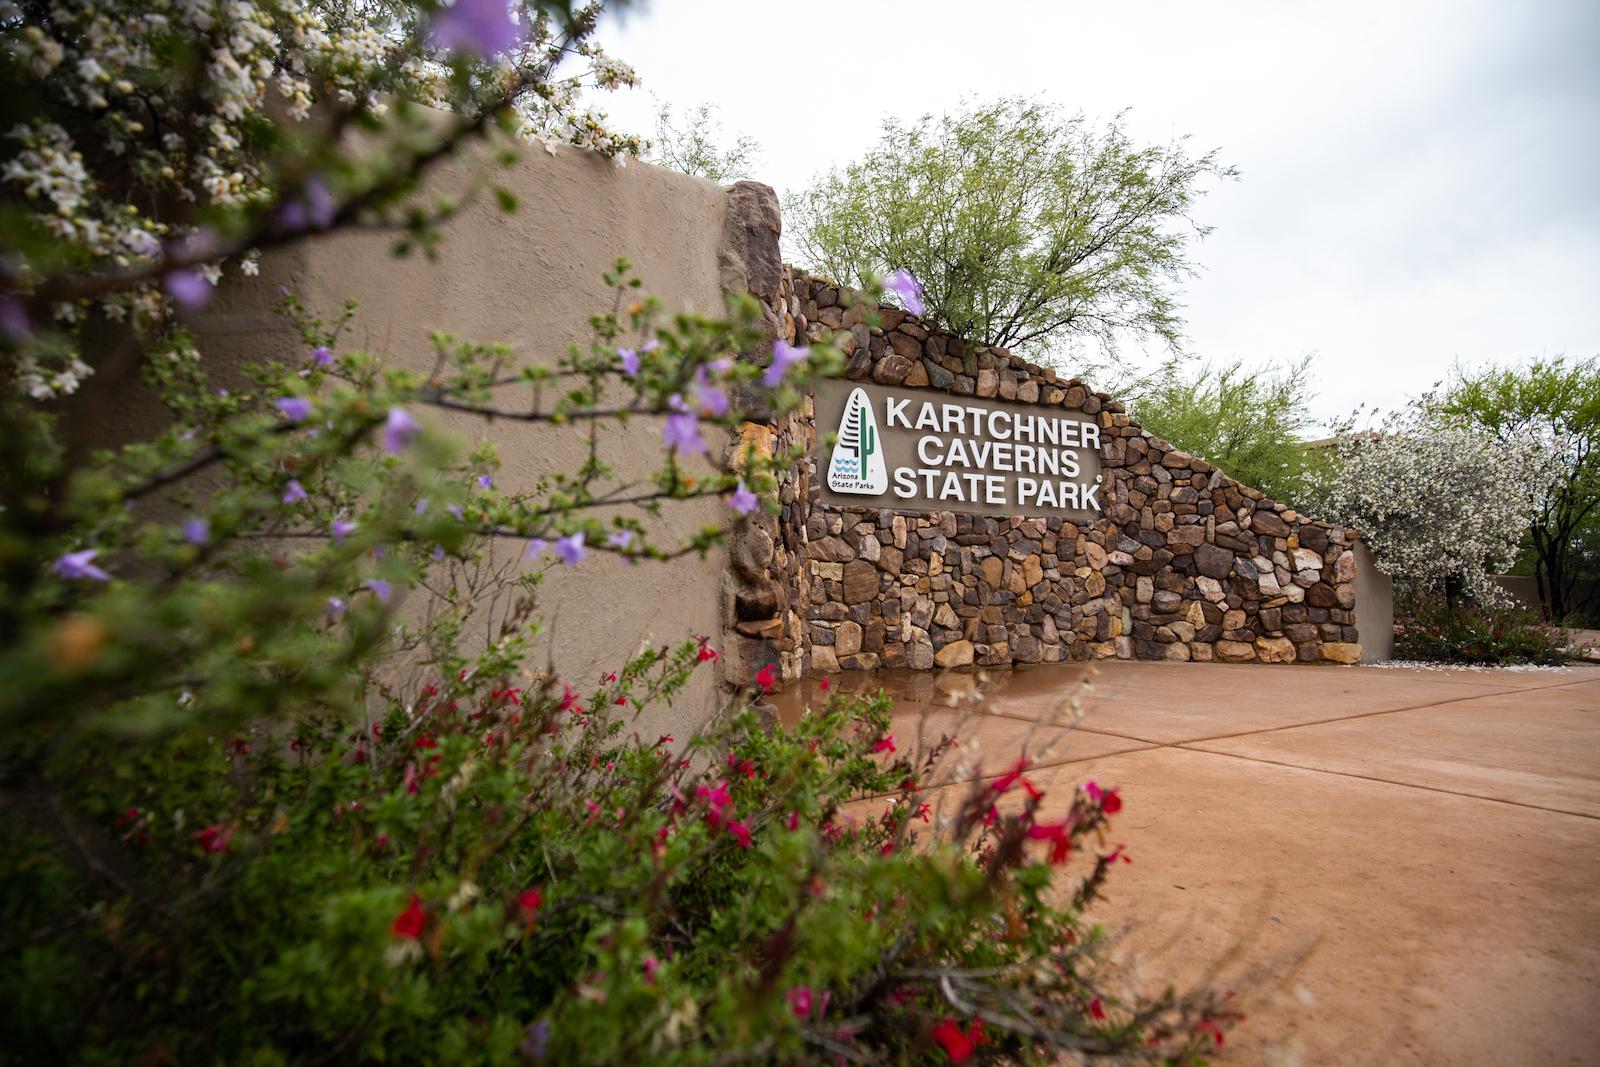 Kartchner Caverns State Park in Sierra Vista, AZ